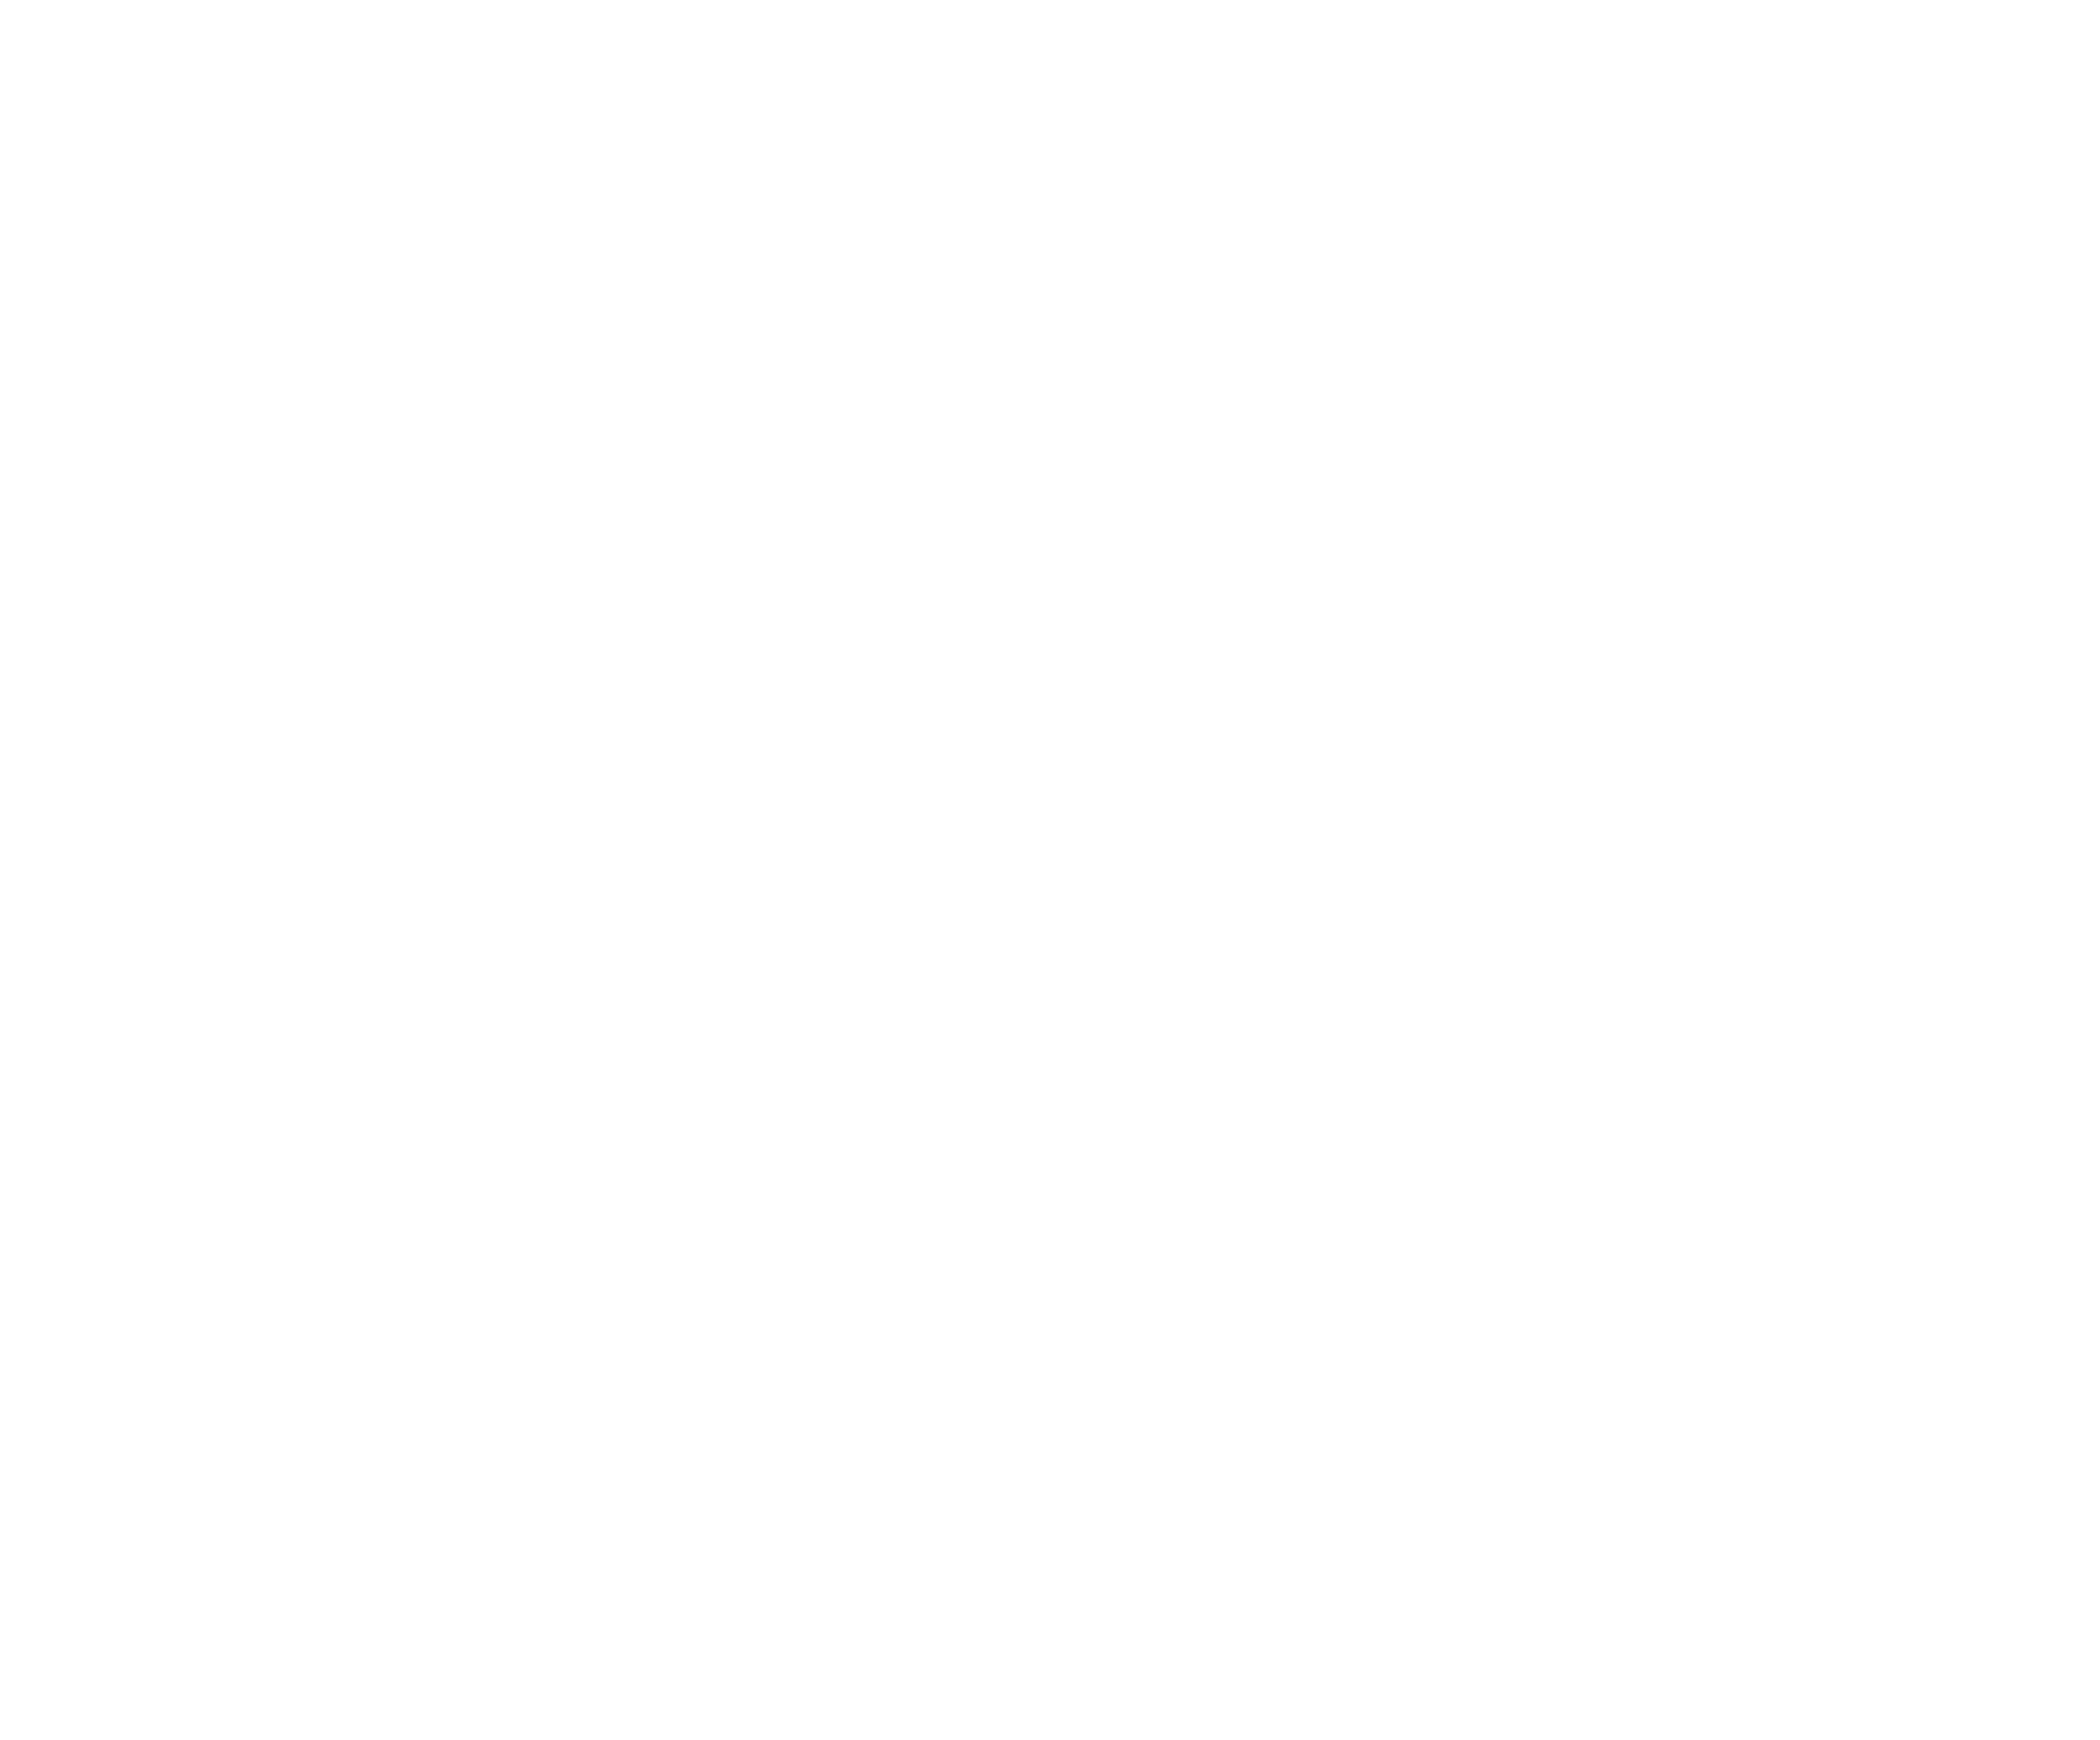 NARS PRO: Pro Makeup Artist Discounts | NARS Cosmetics